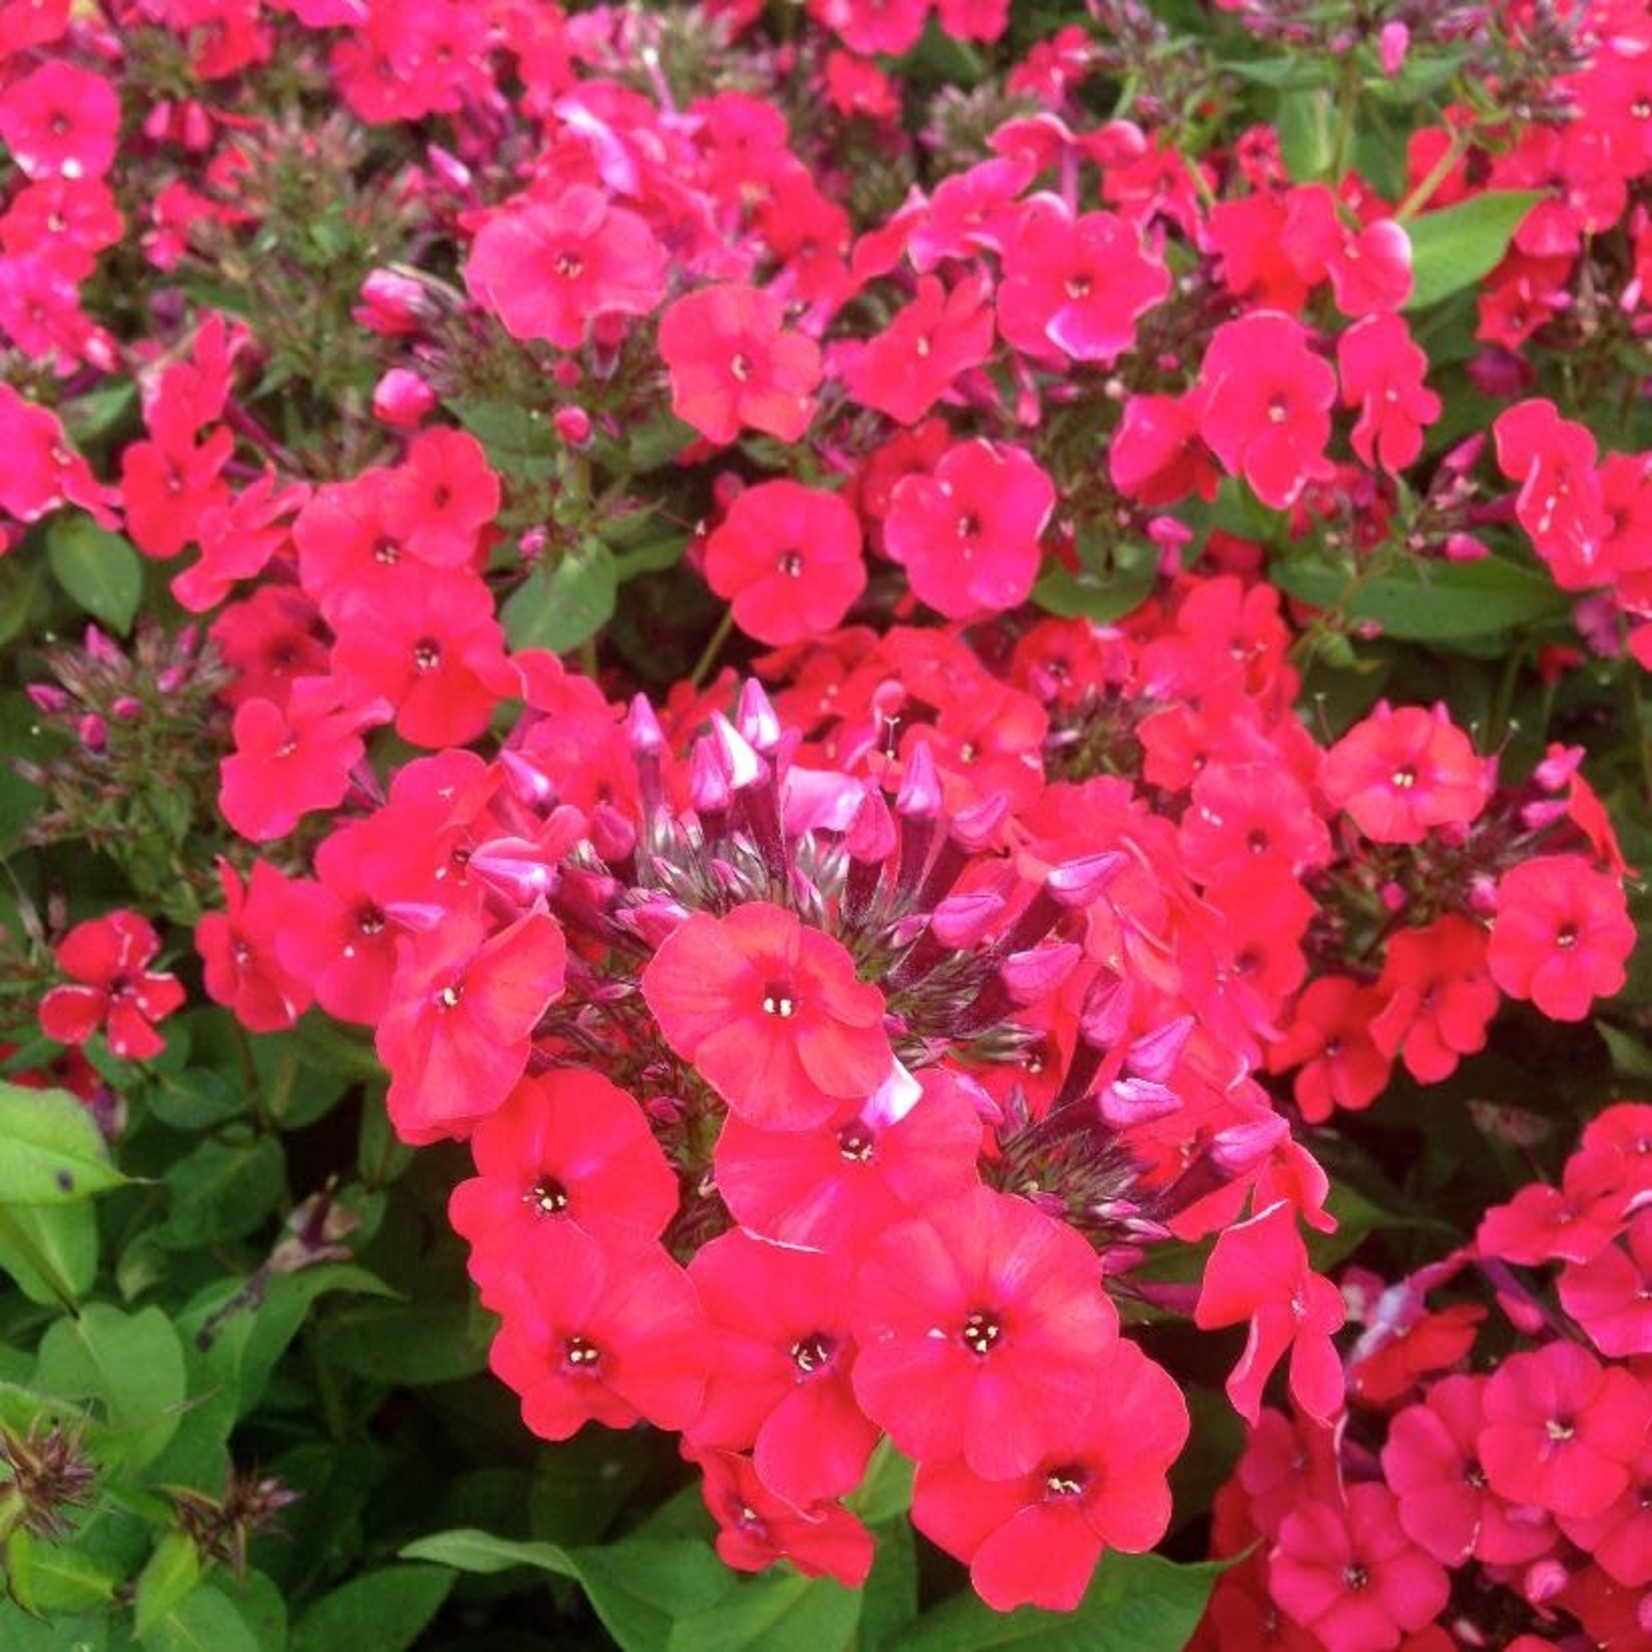 Garden Phlox 'red riding hood' - 1 gal